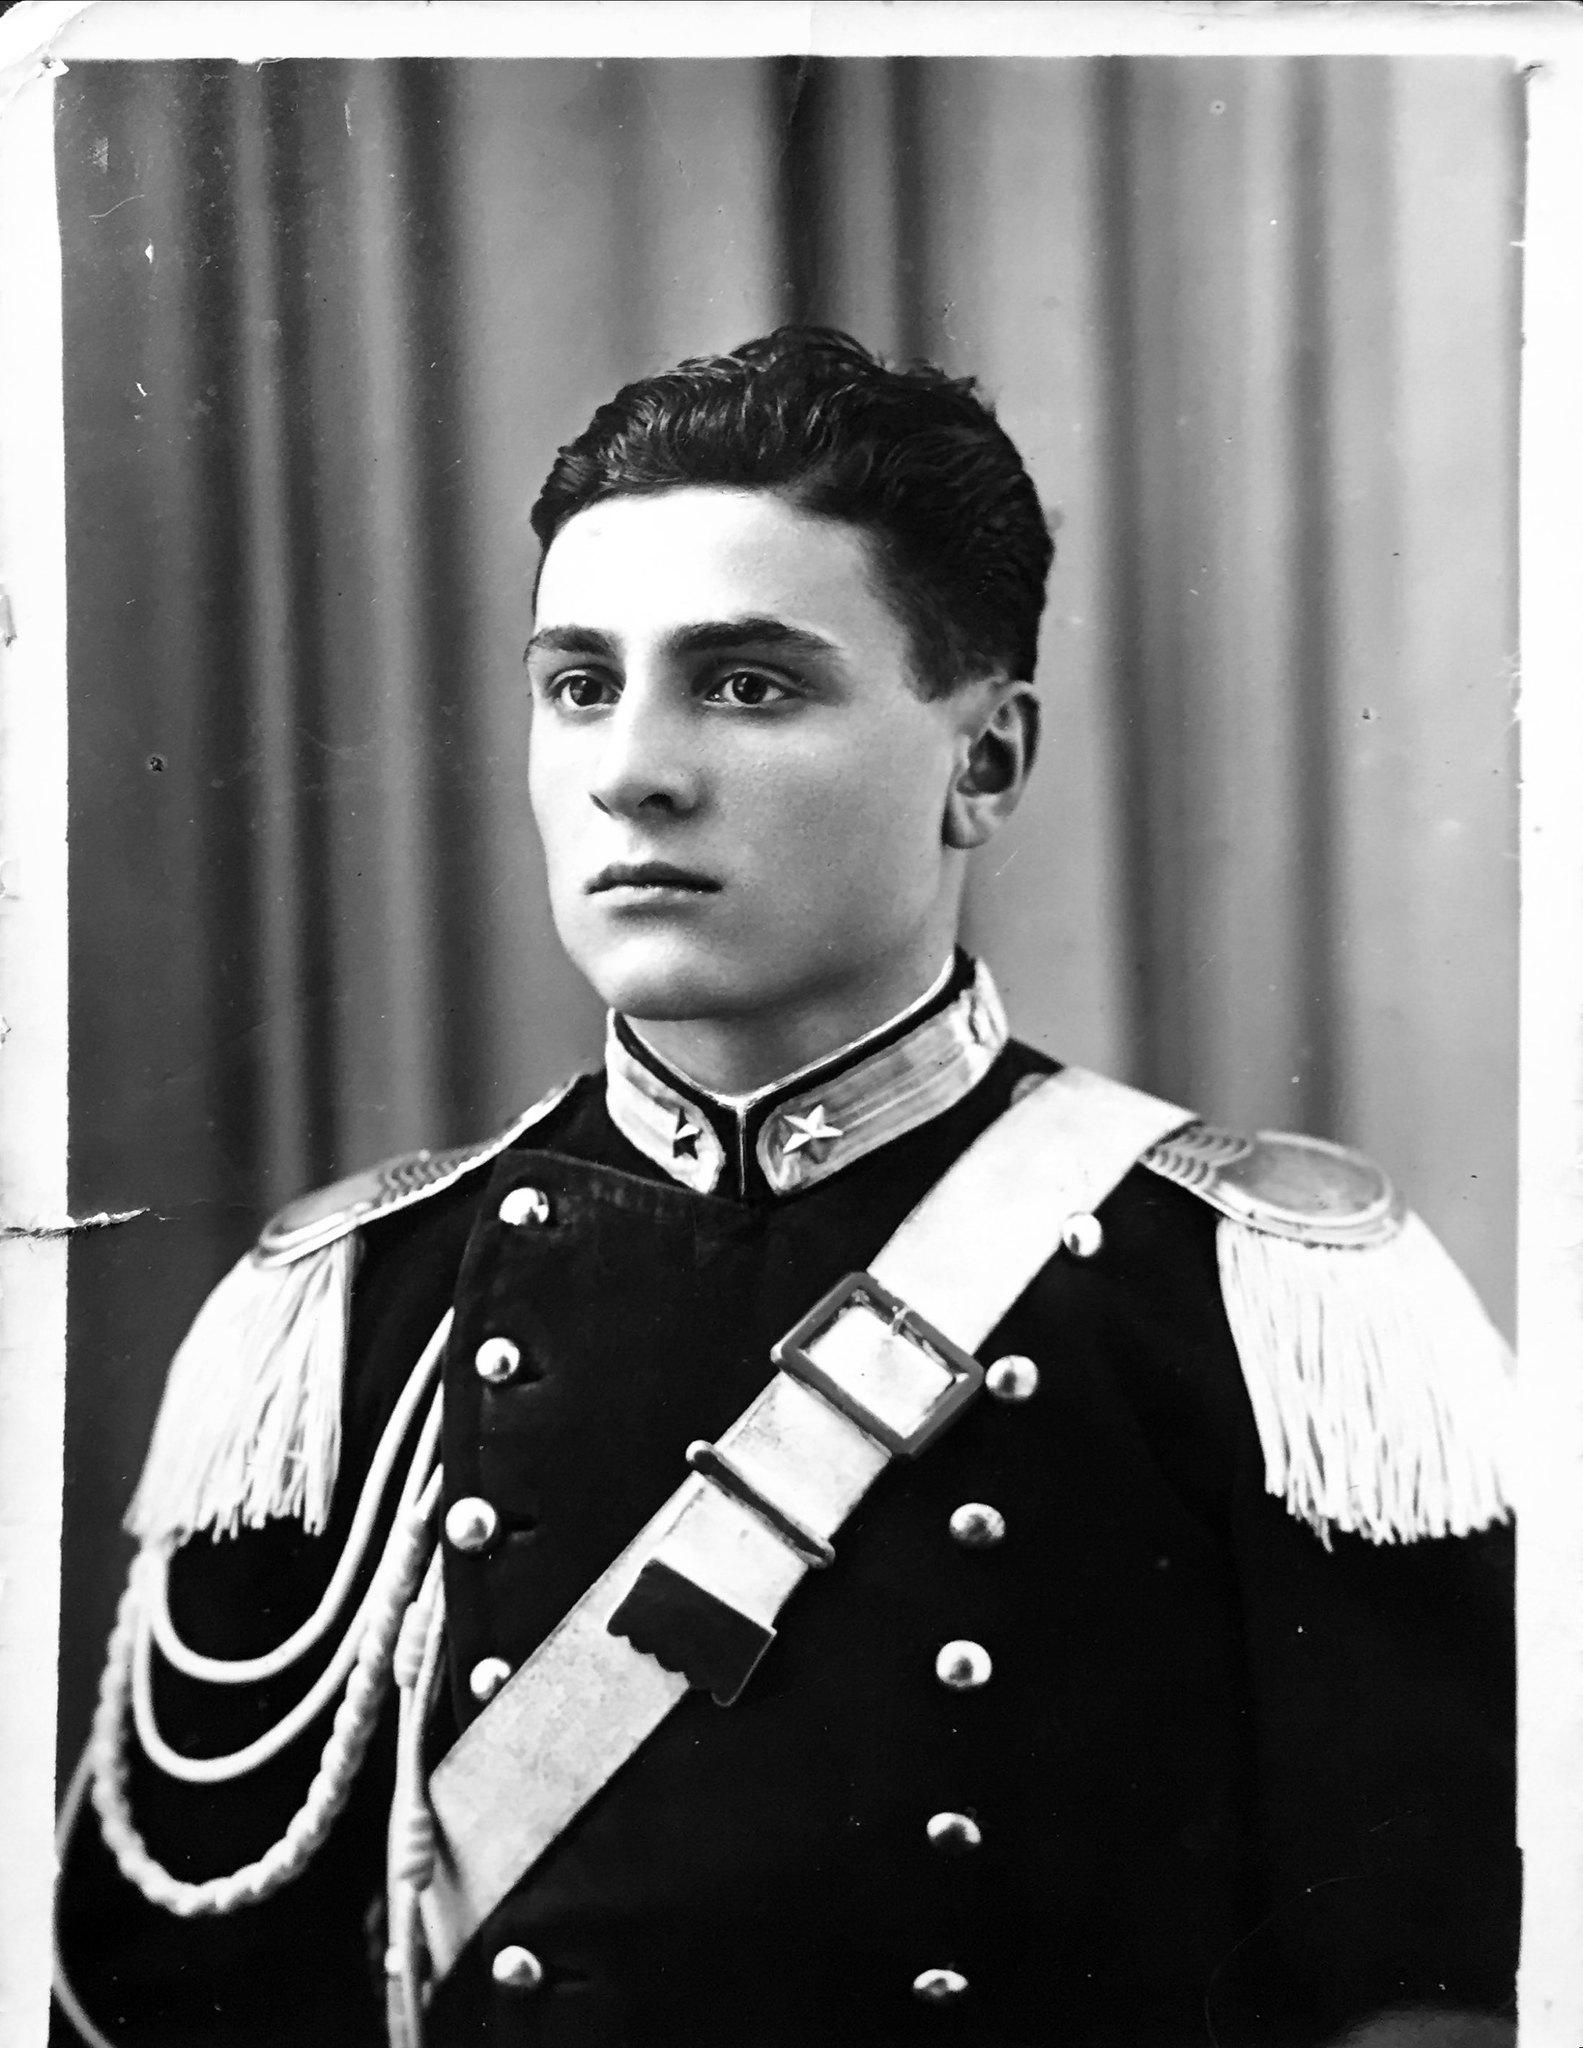 carabiniere-sansalone-mario-classe-1942_39639708542_o